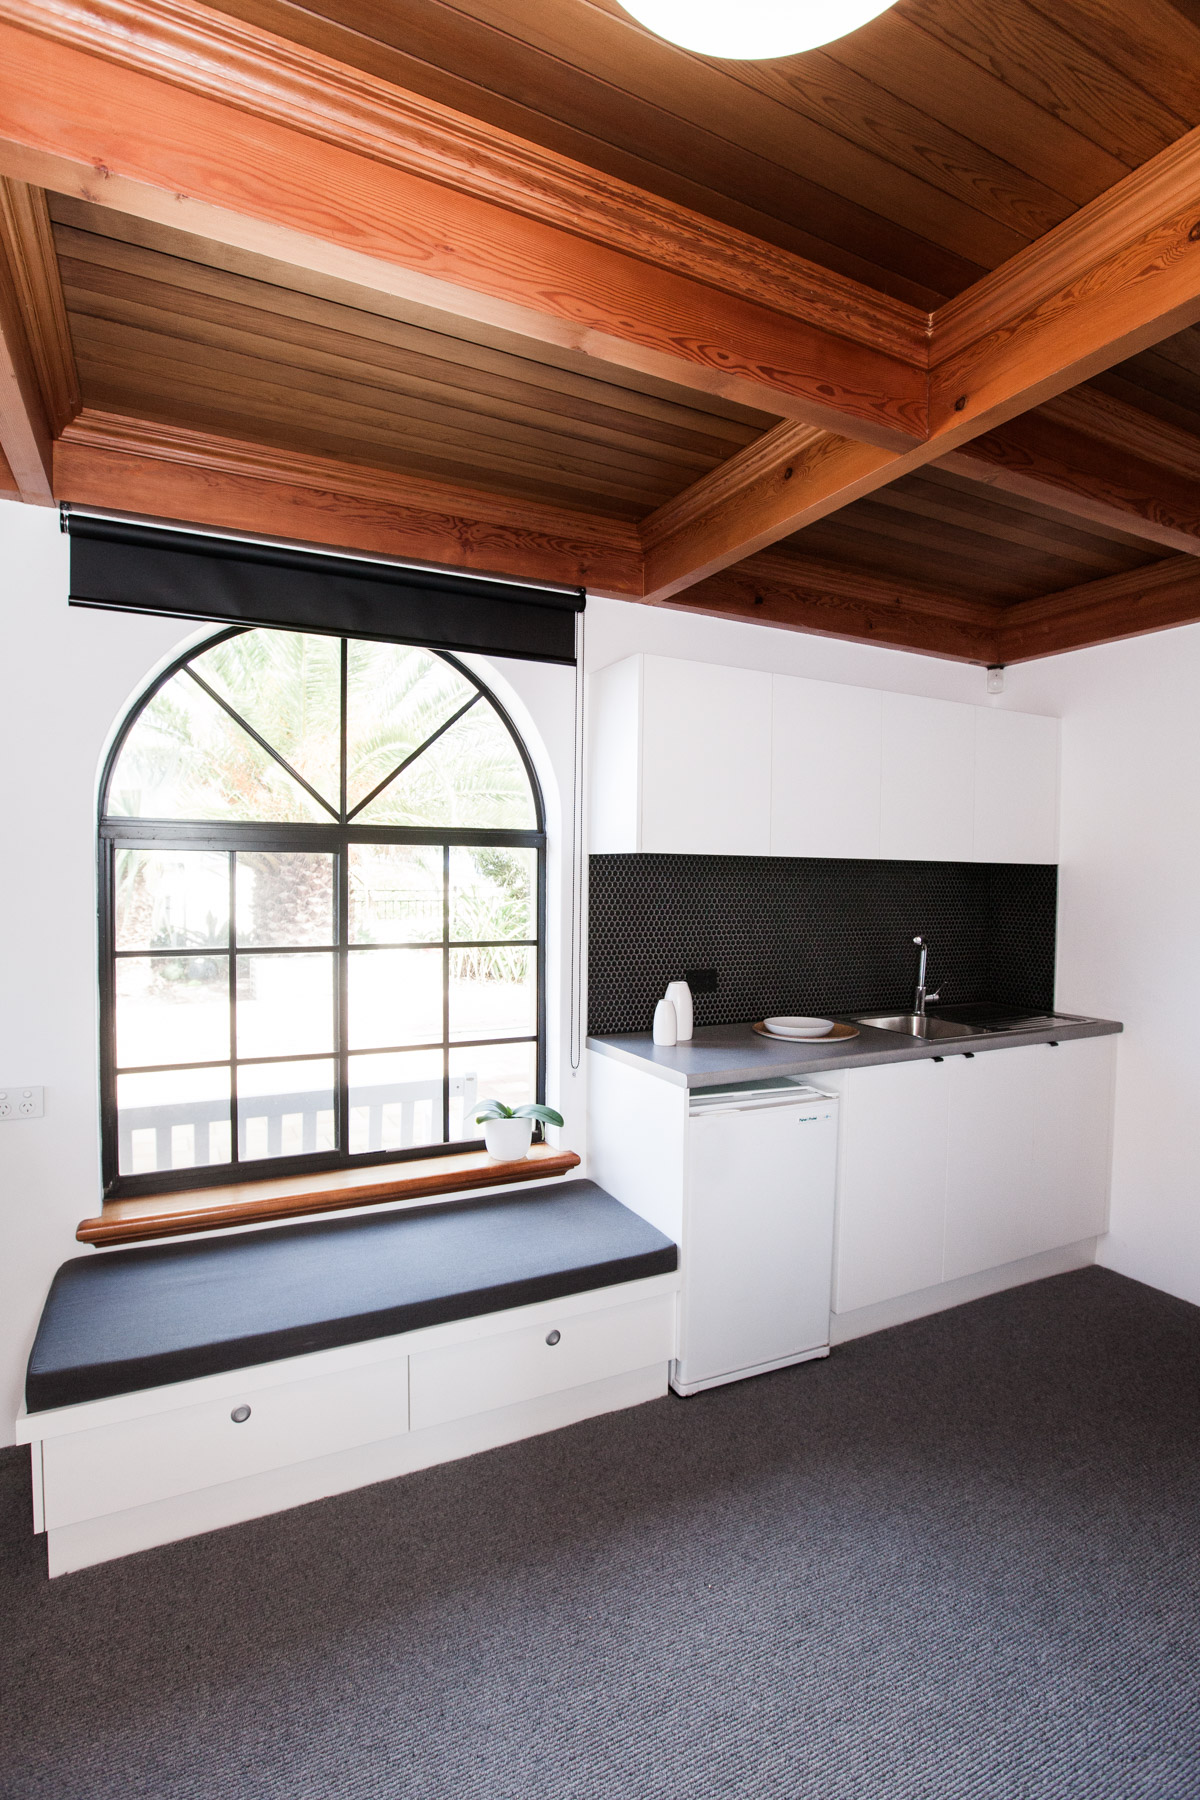 Study Kitchenette & Window Seat